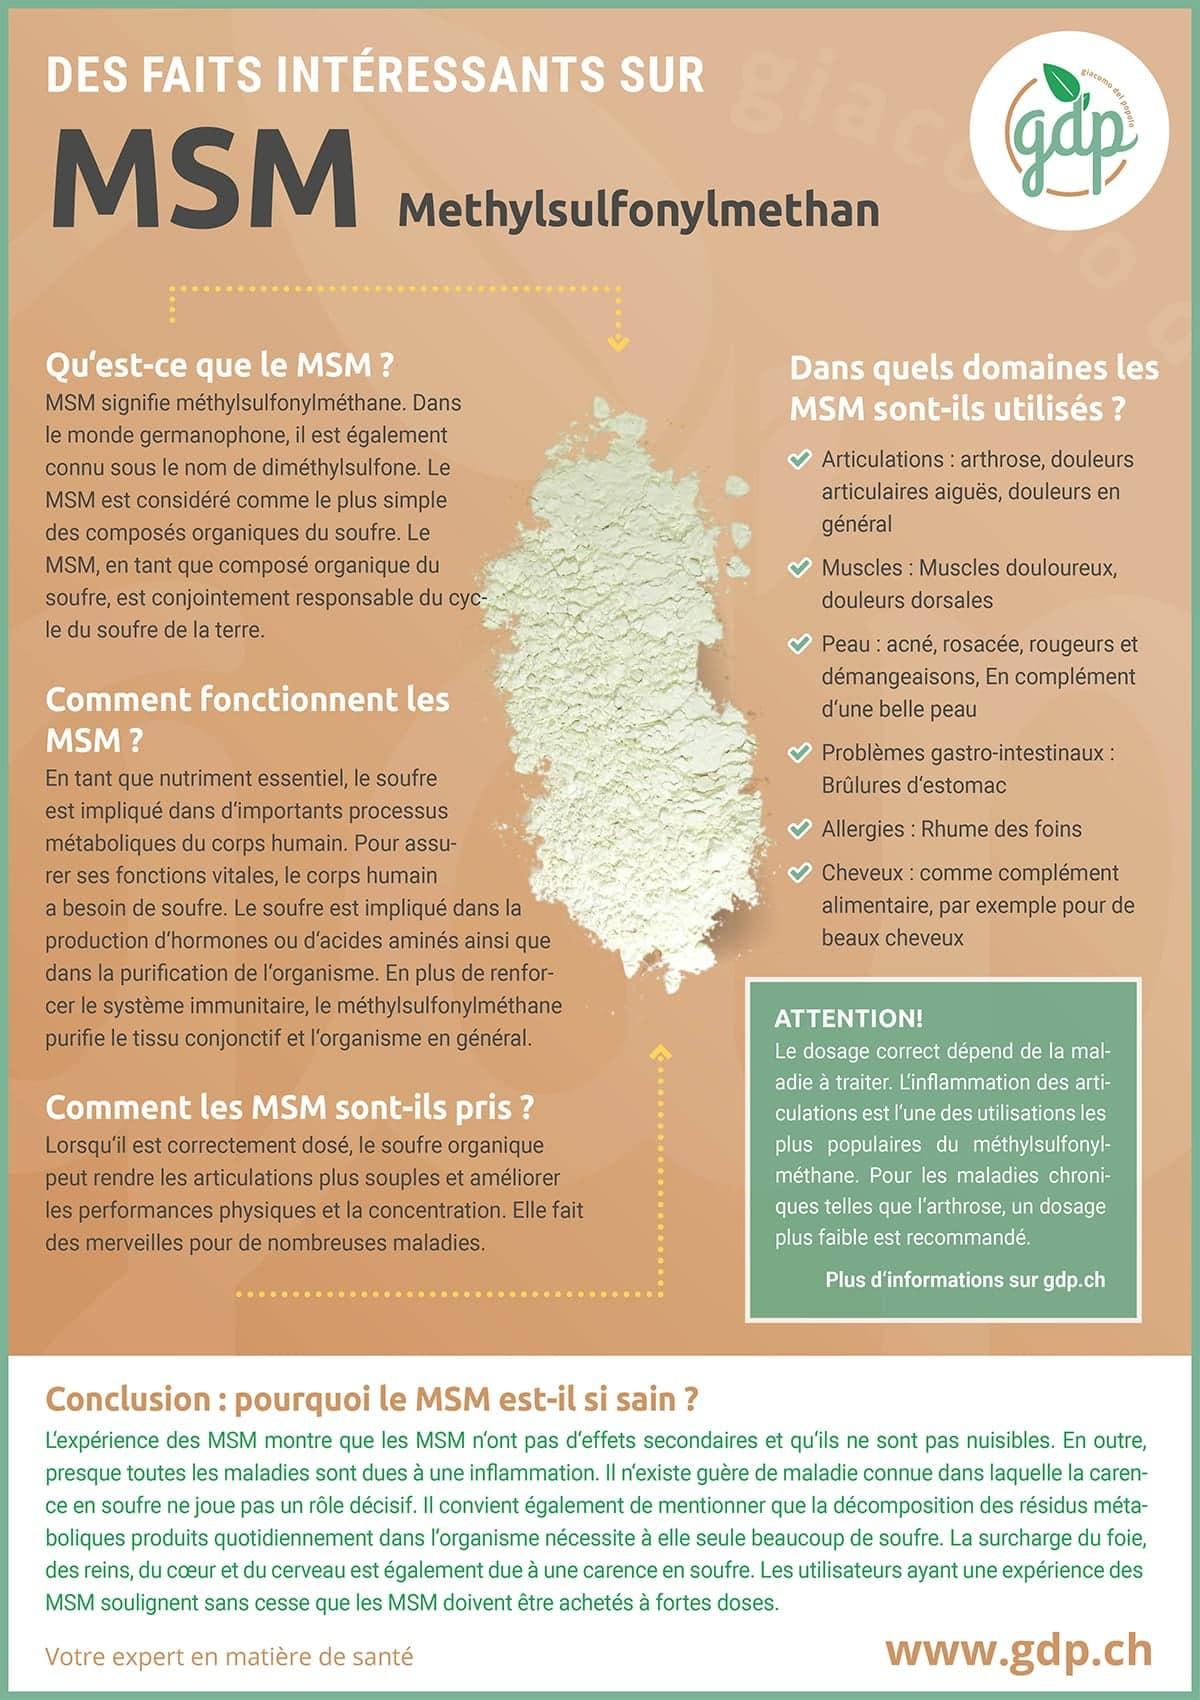 gdp Graphique d'information MSM